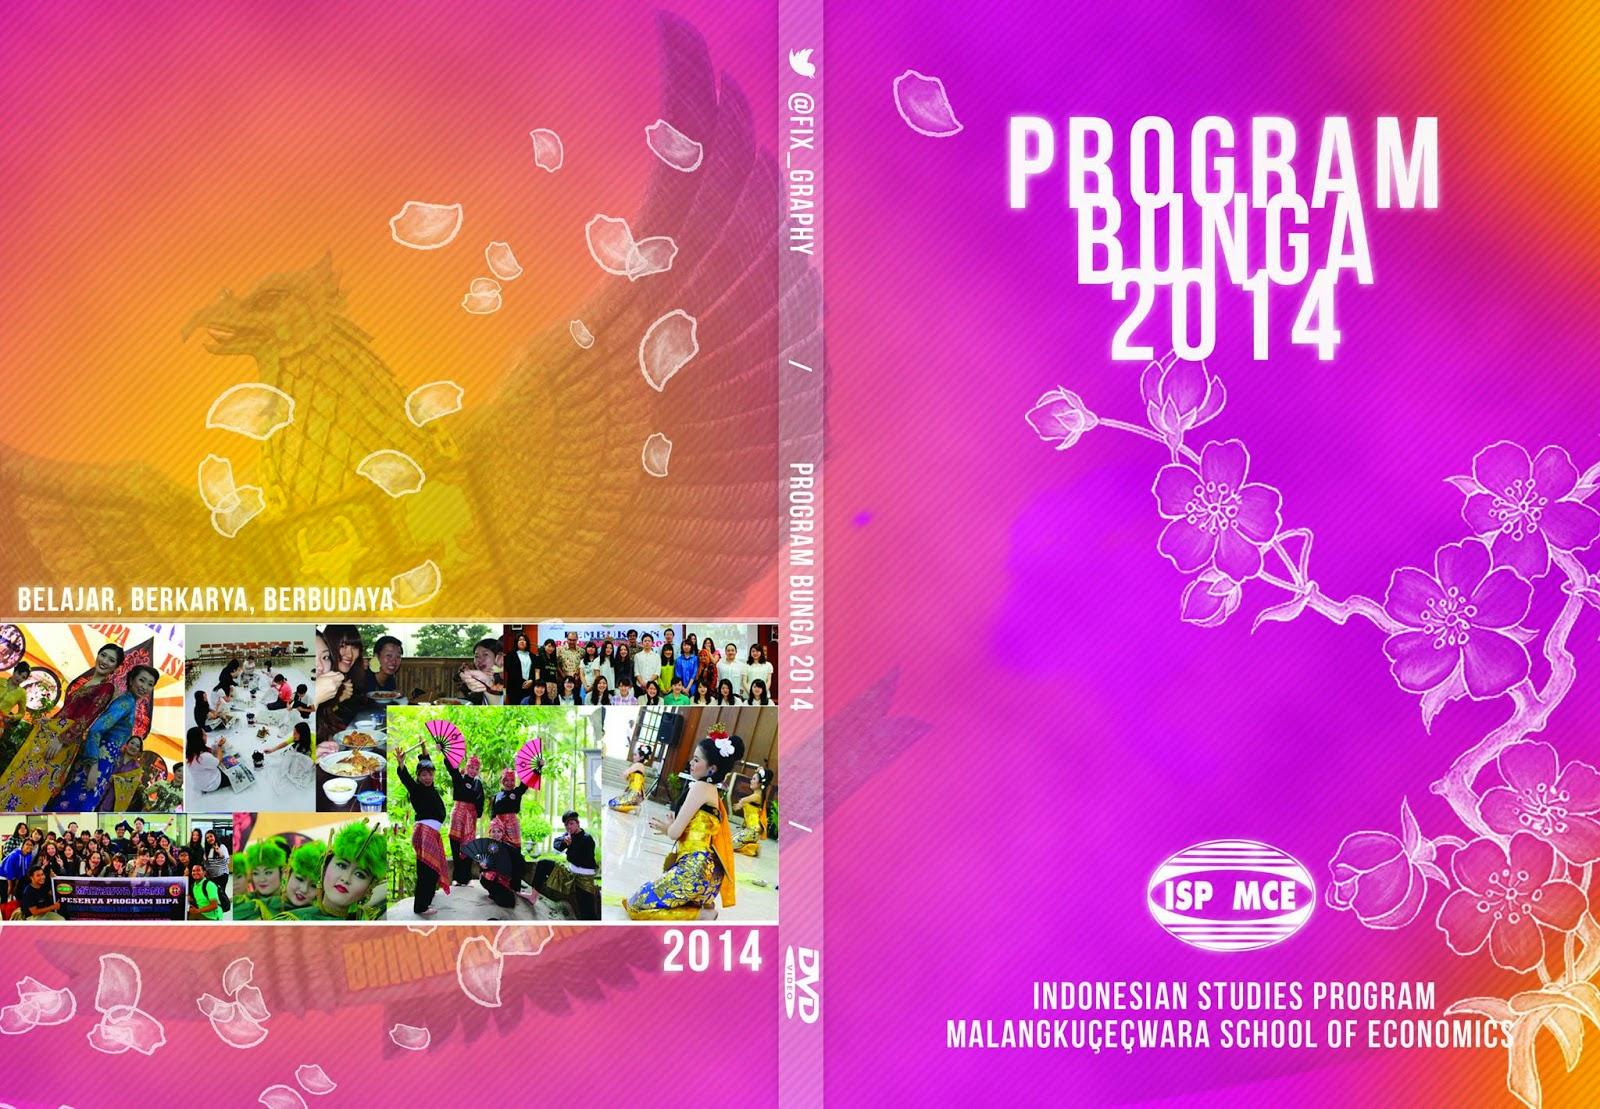 Desain Cover DVD Program Bunga 2014 ISP Malangkucecwara